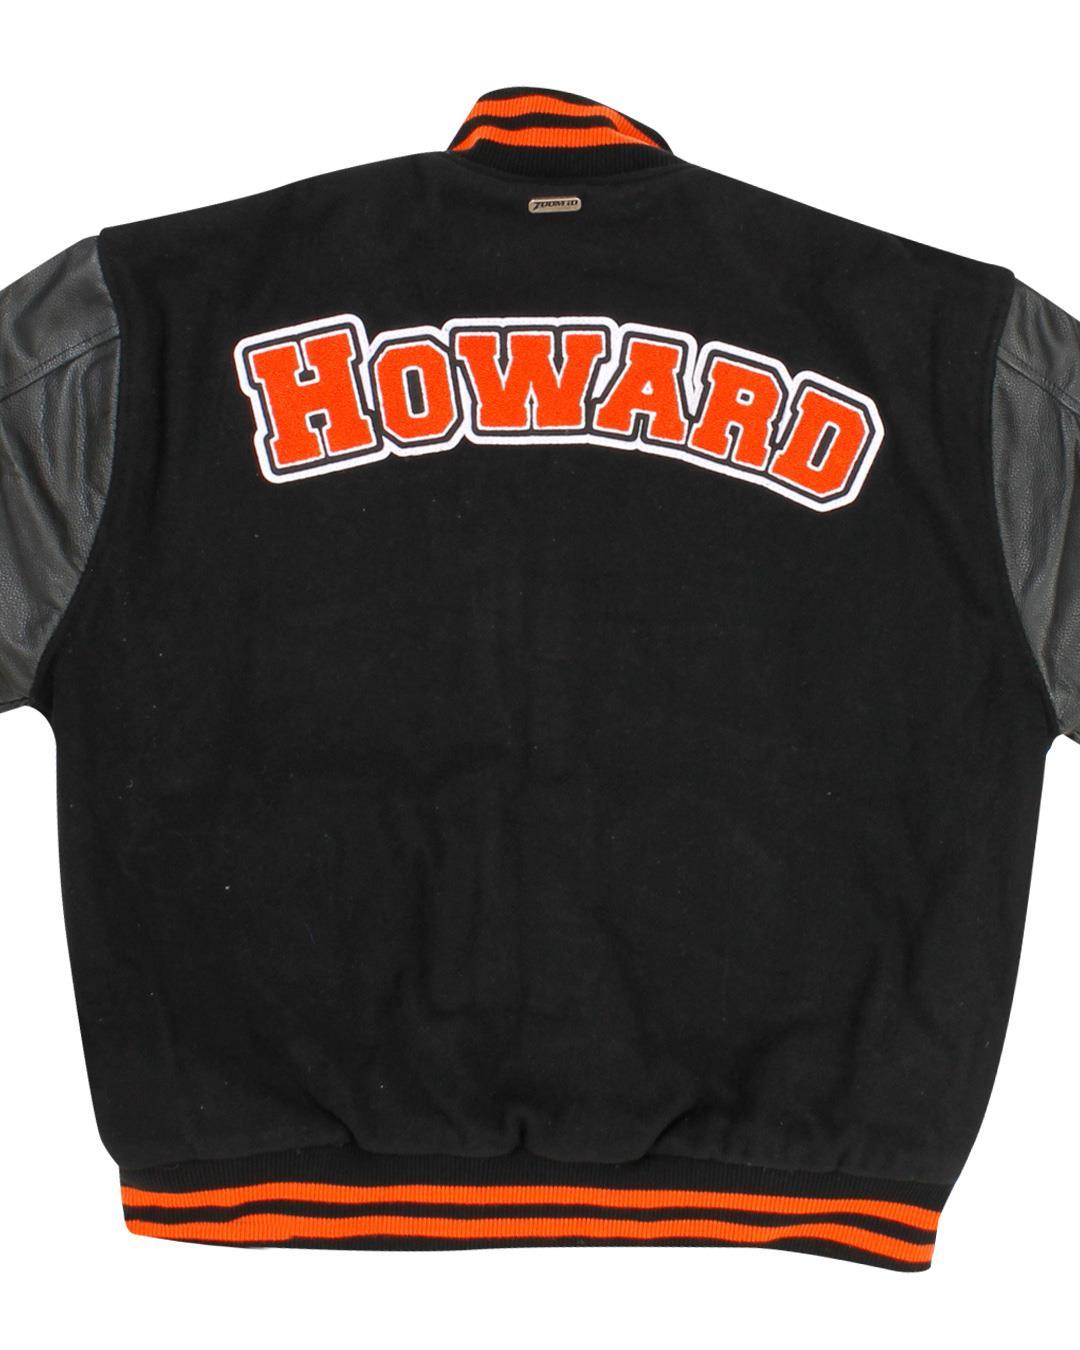 Coweta High School Letterman Jacket, Coweta OK